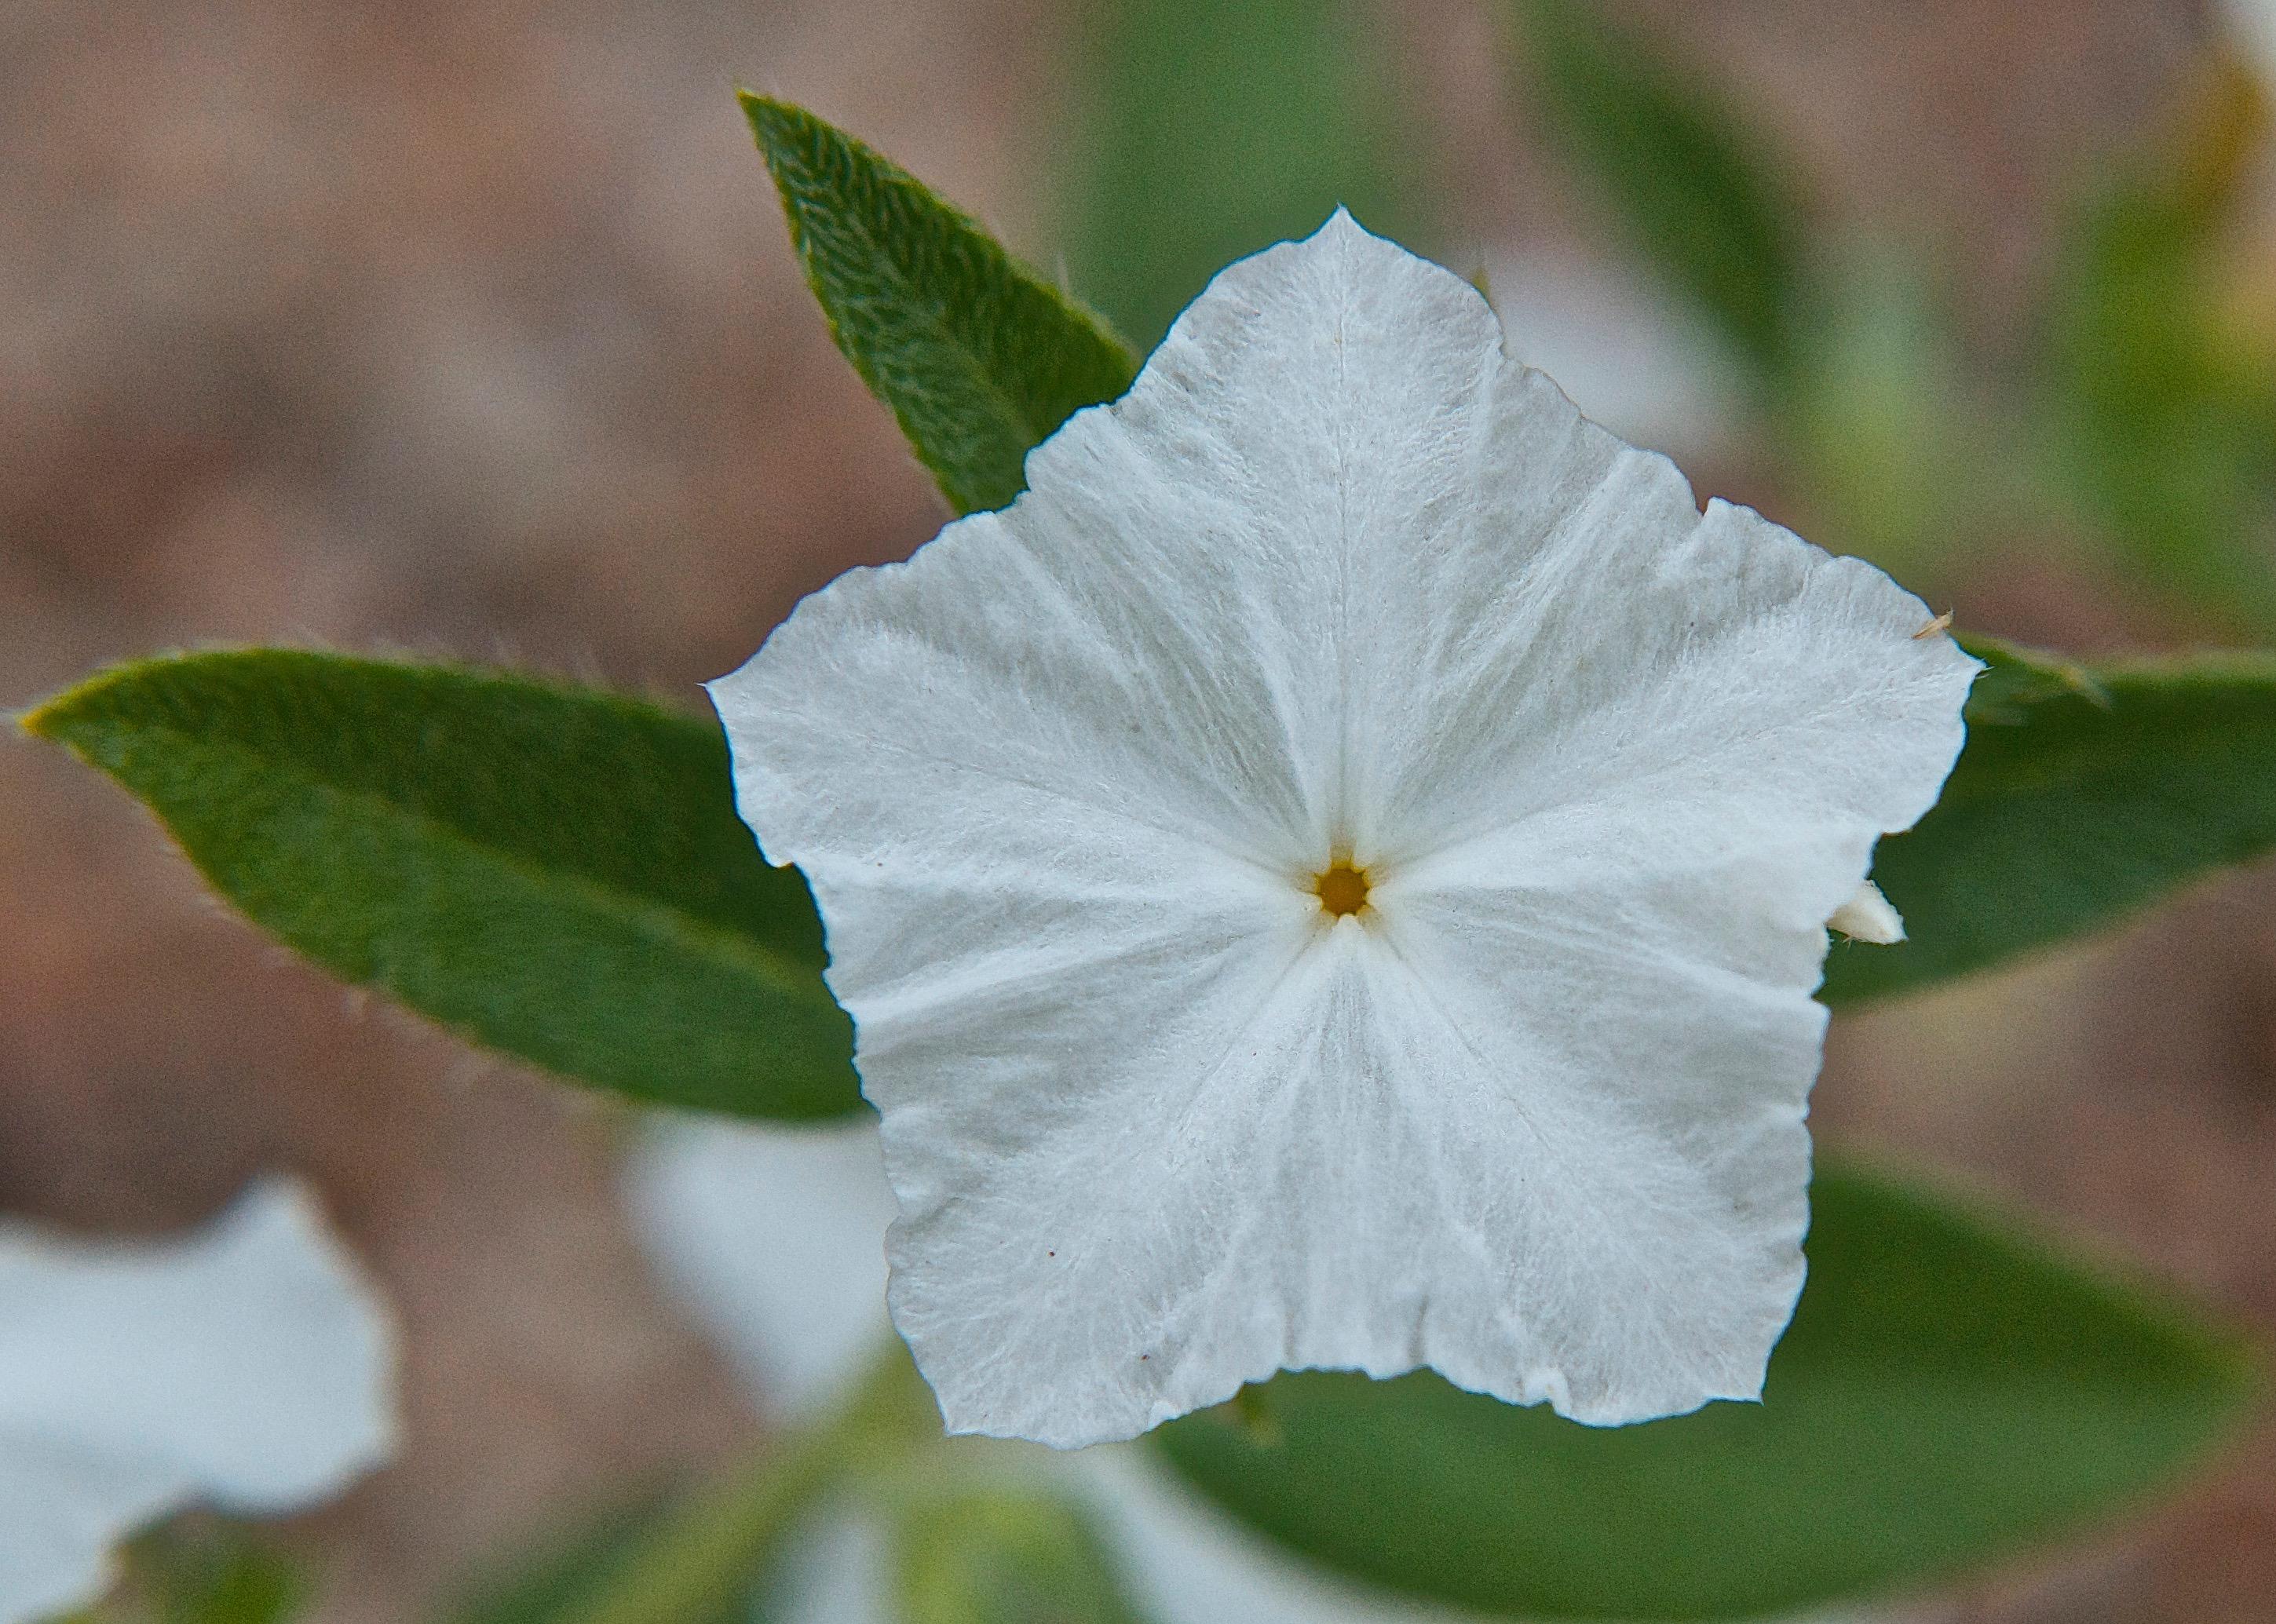 Shaggy Dwarf Morningglory (Evolvulus nuttallianus)